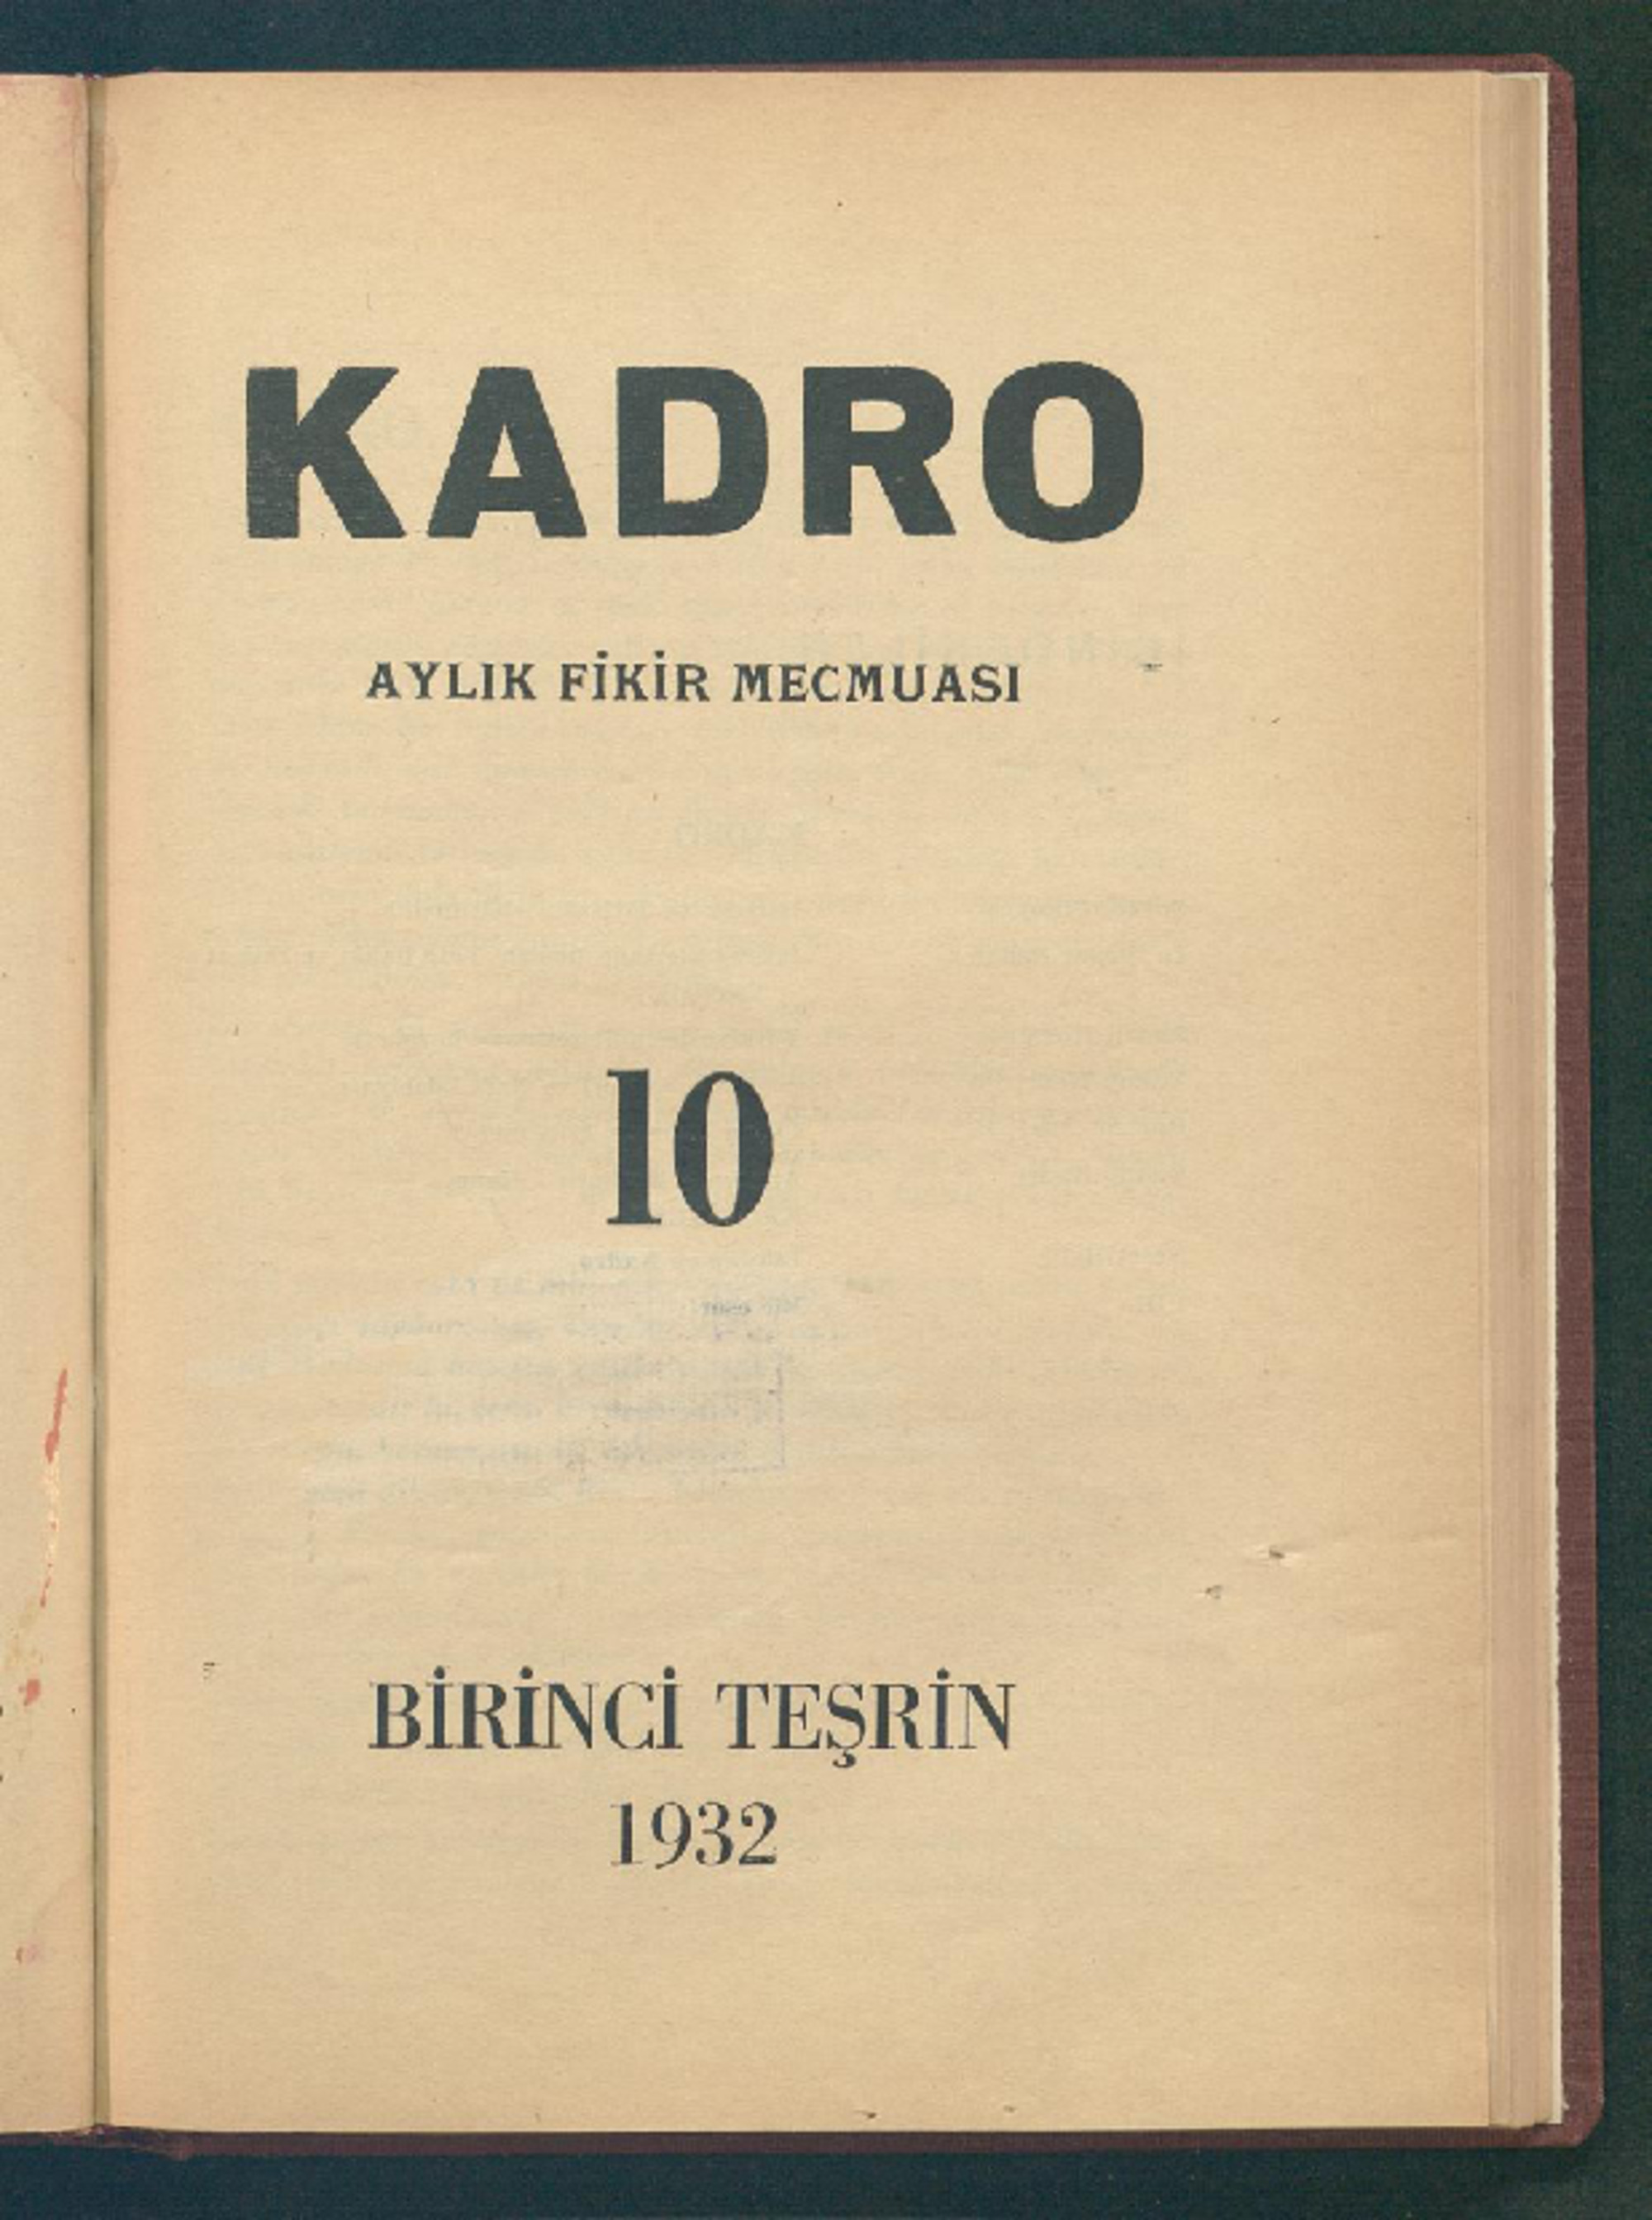 1 Ekim 1932 Tarihli Kadro Dergisi Sayfa 1